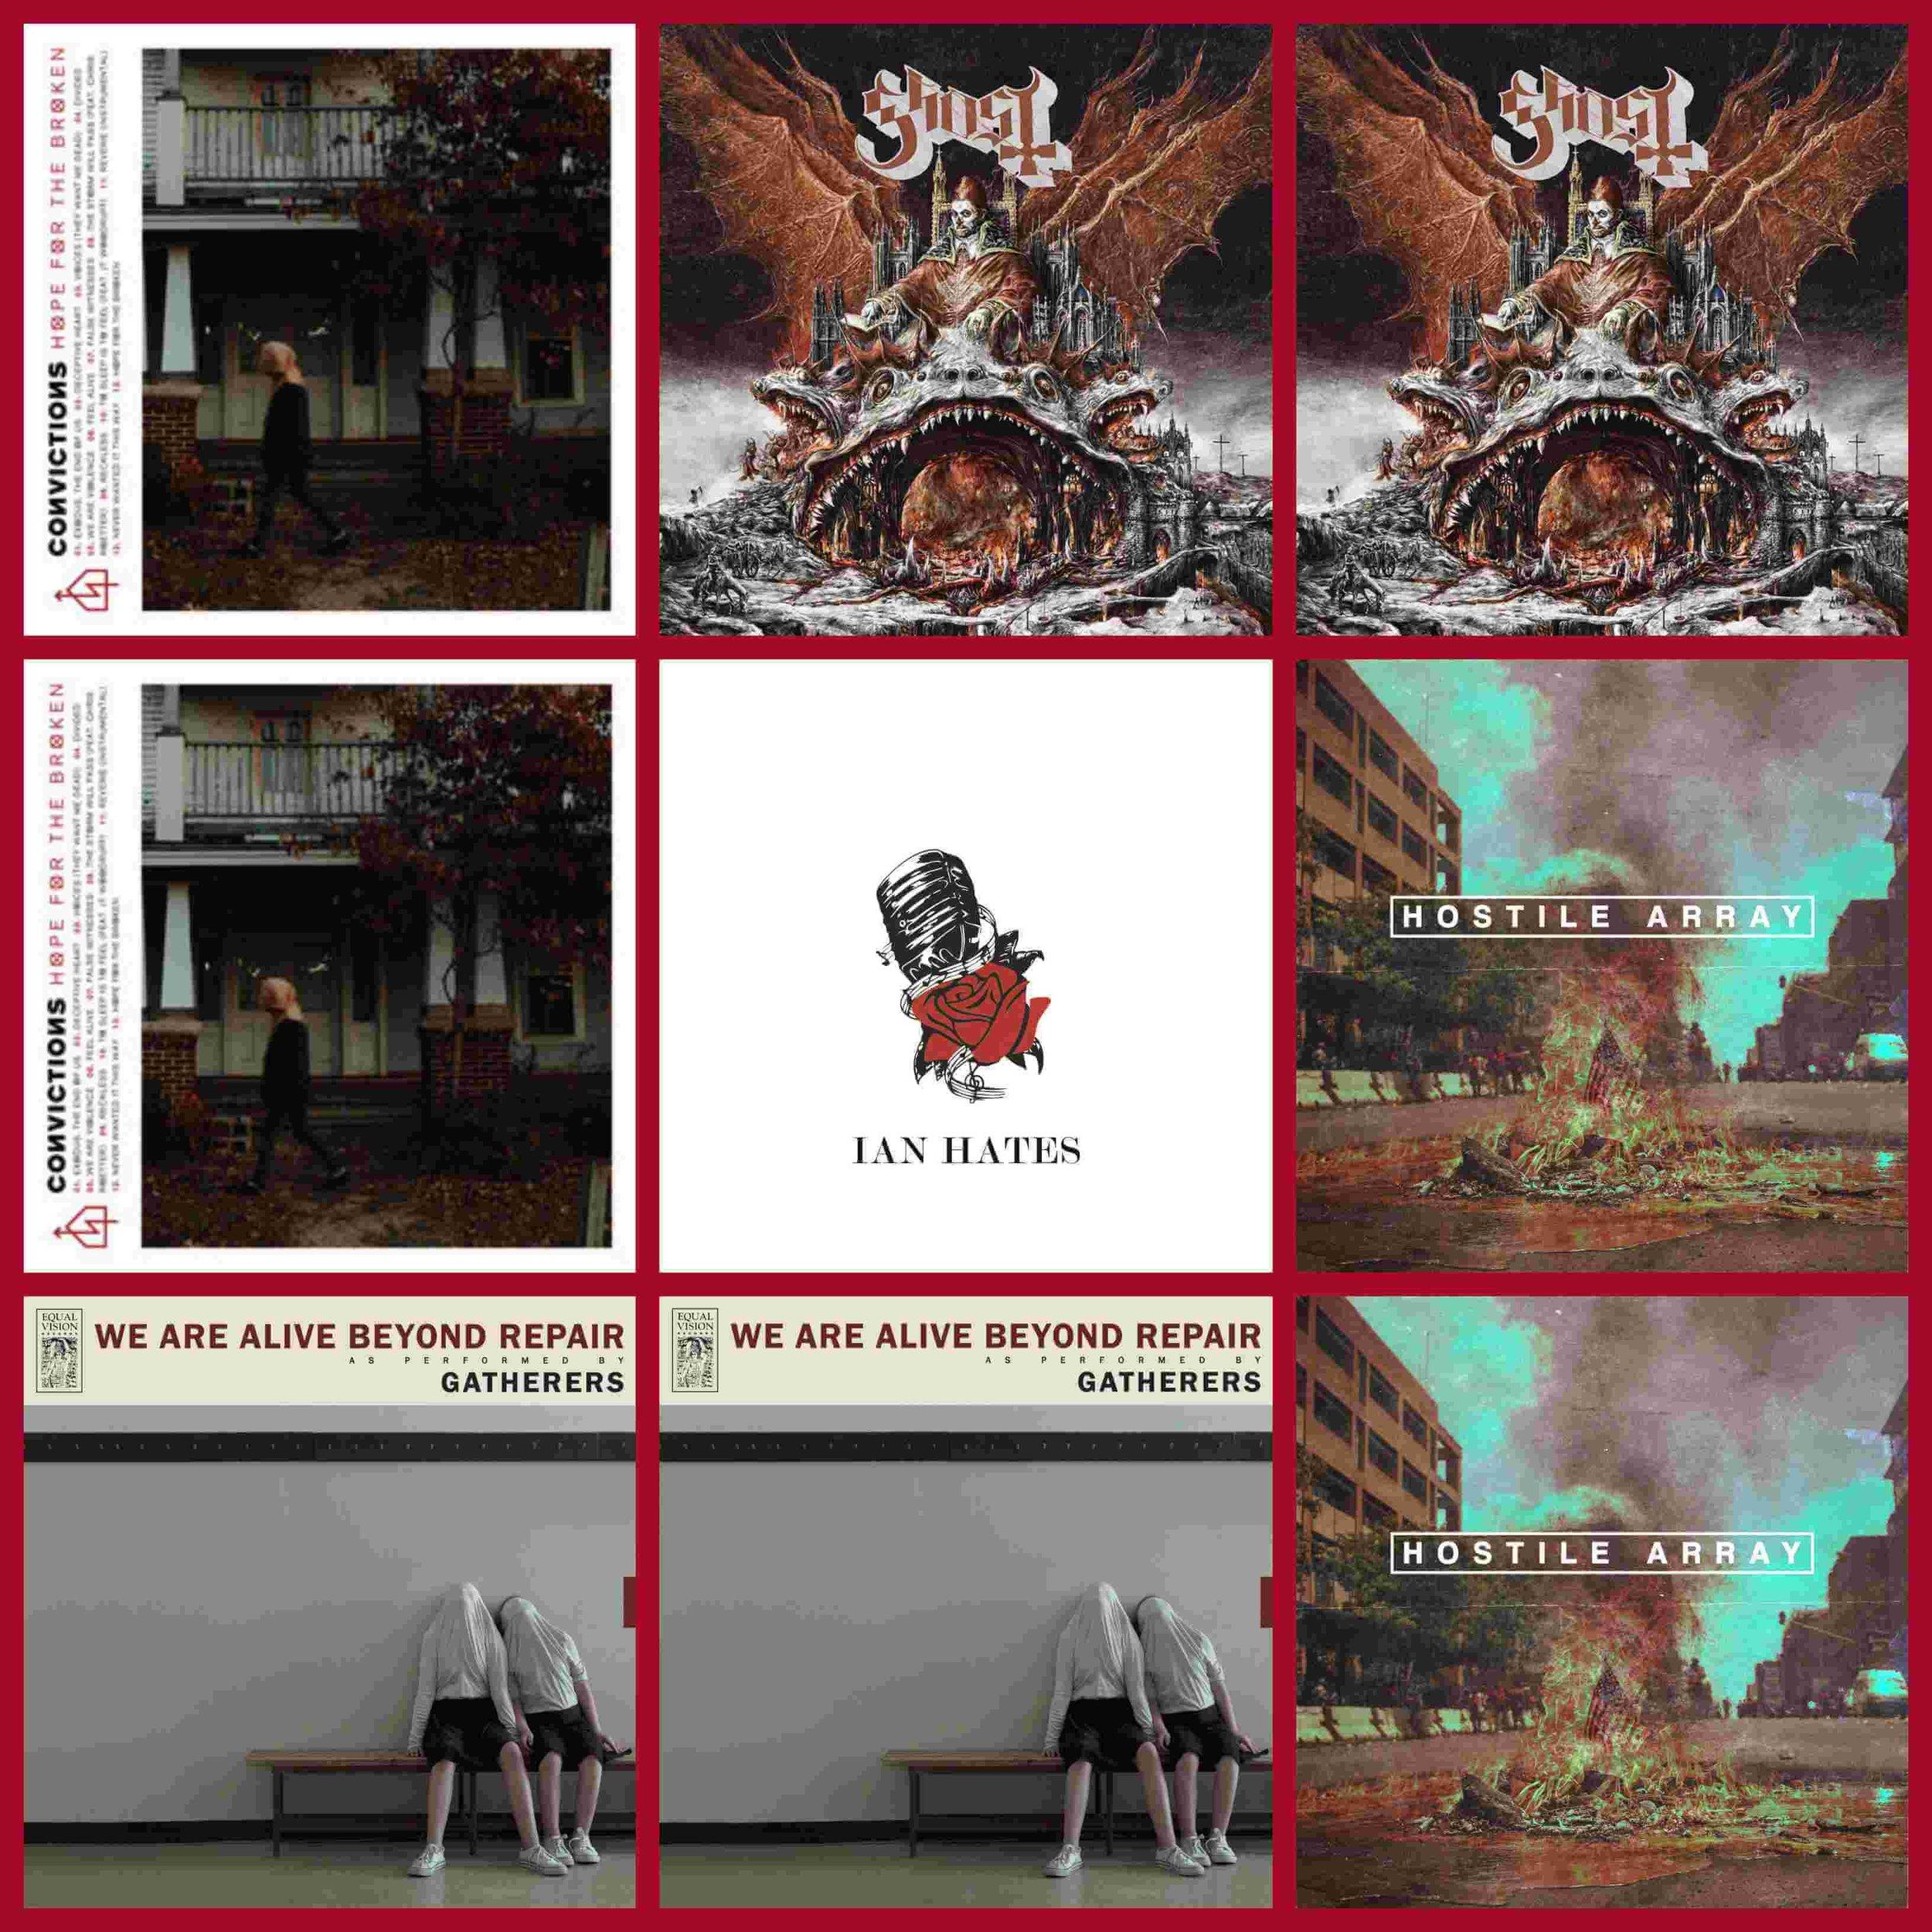 20180607 Albums 2 (1).jpg